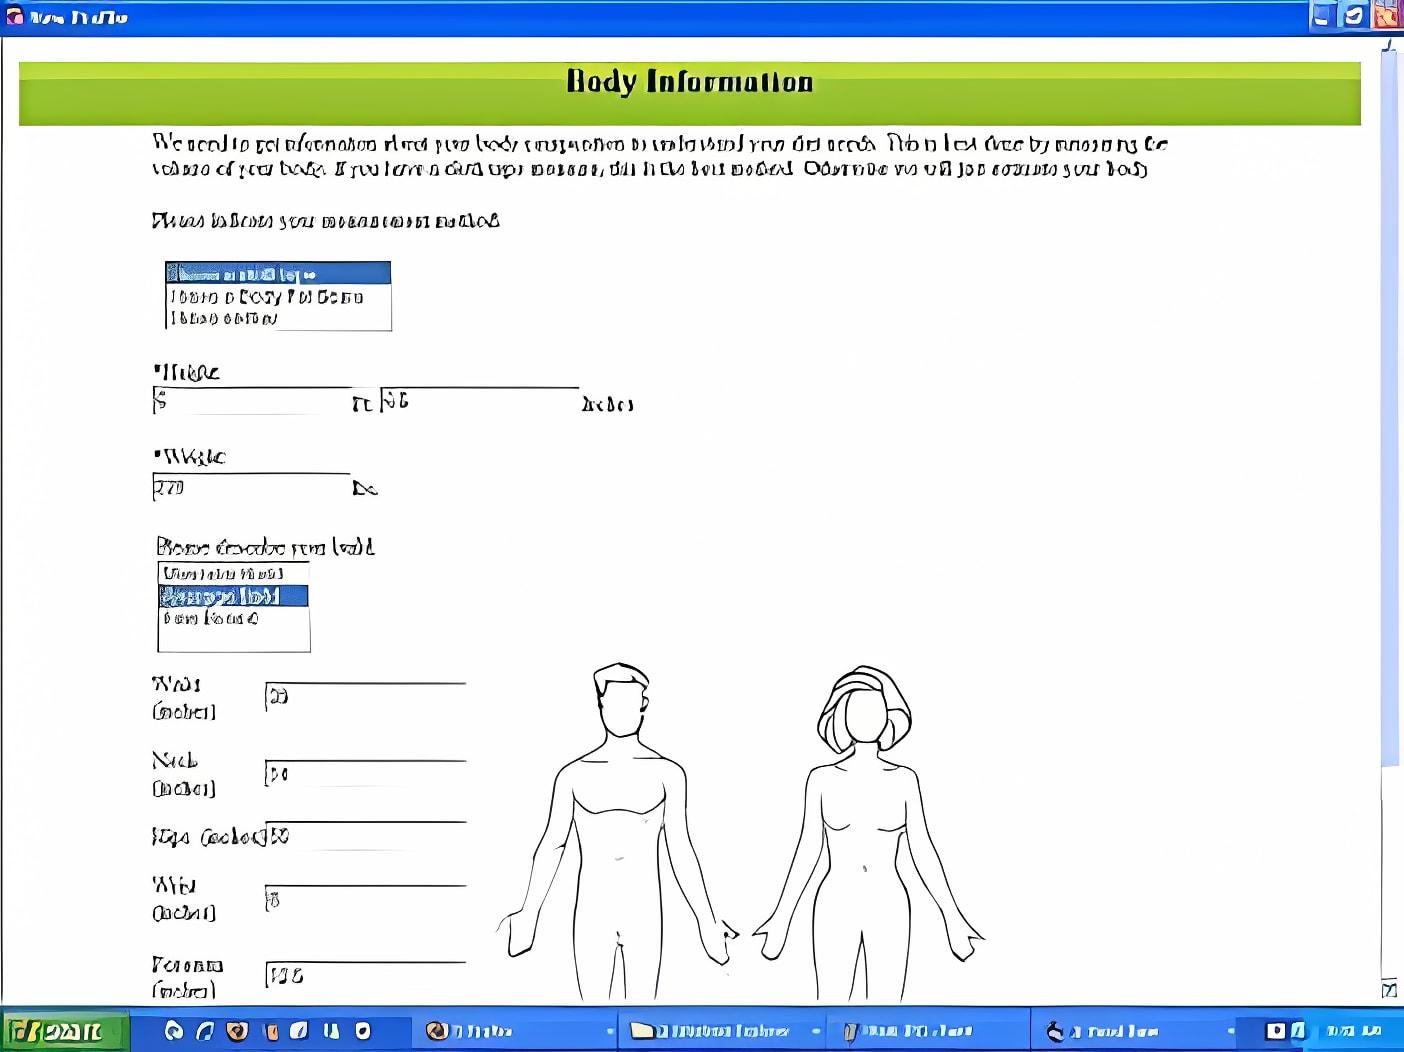 Calorie Balance Tracker